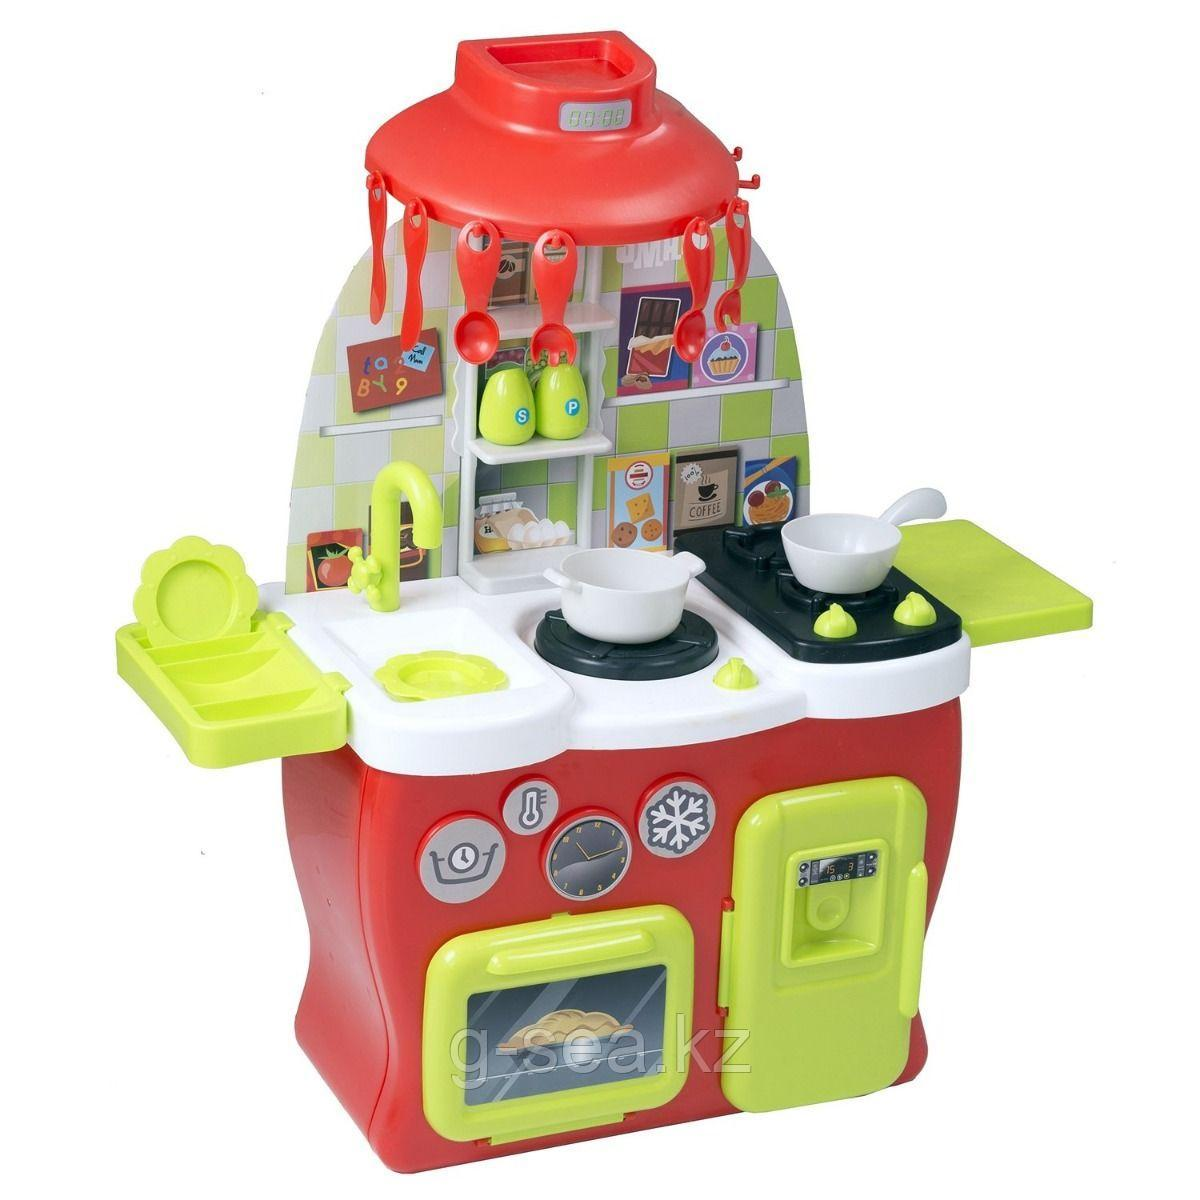 HTI: Моя первая электронная кухня Smart